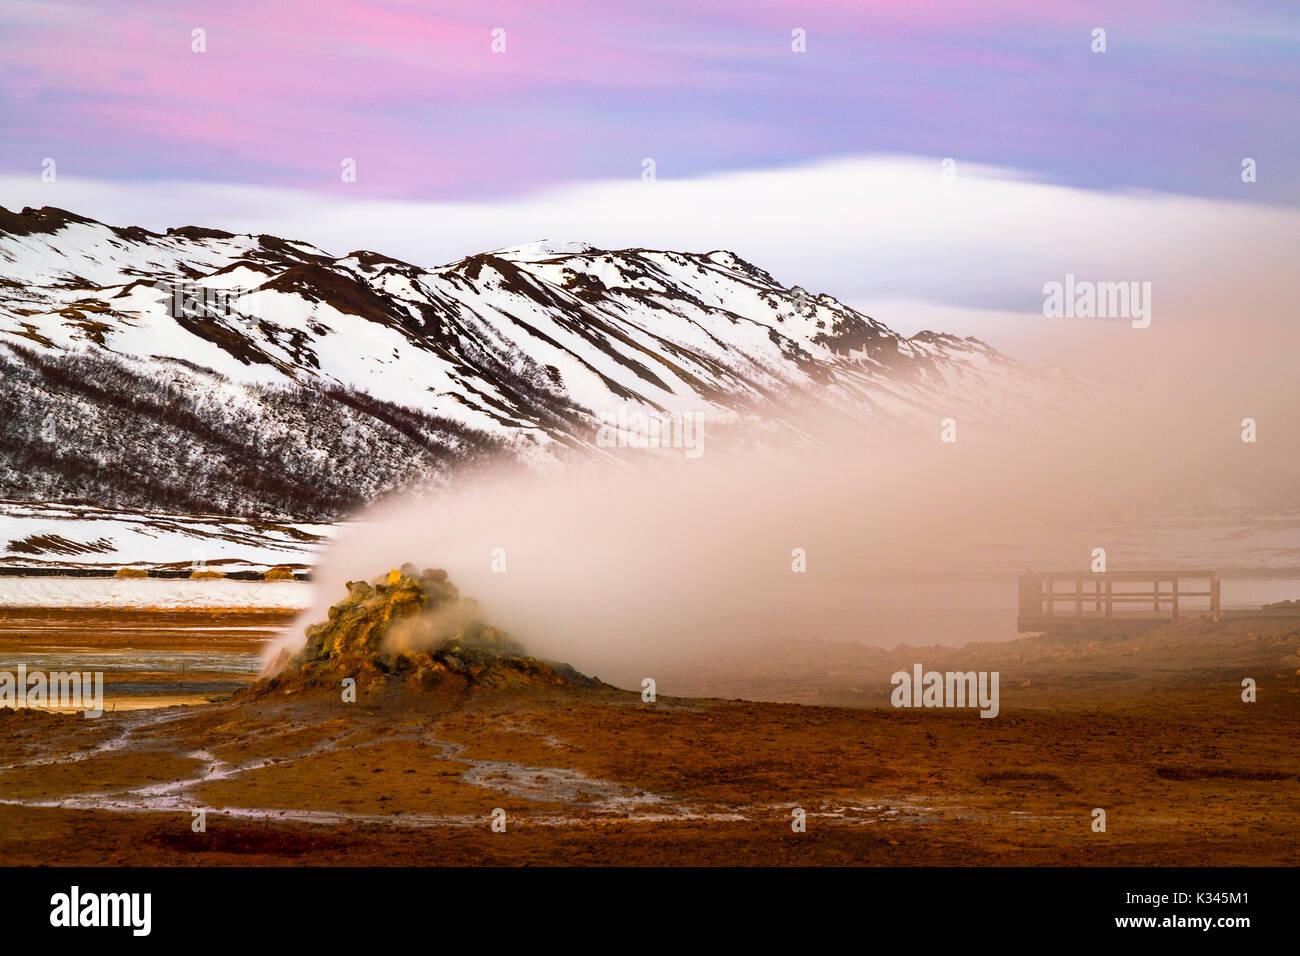 Steaming Fumaroles At Hverarönd, Near Myvatn, Iceland - Stock Image